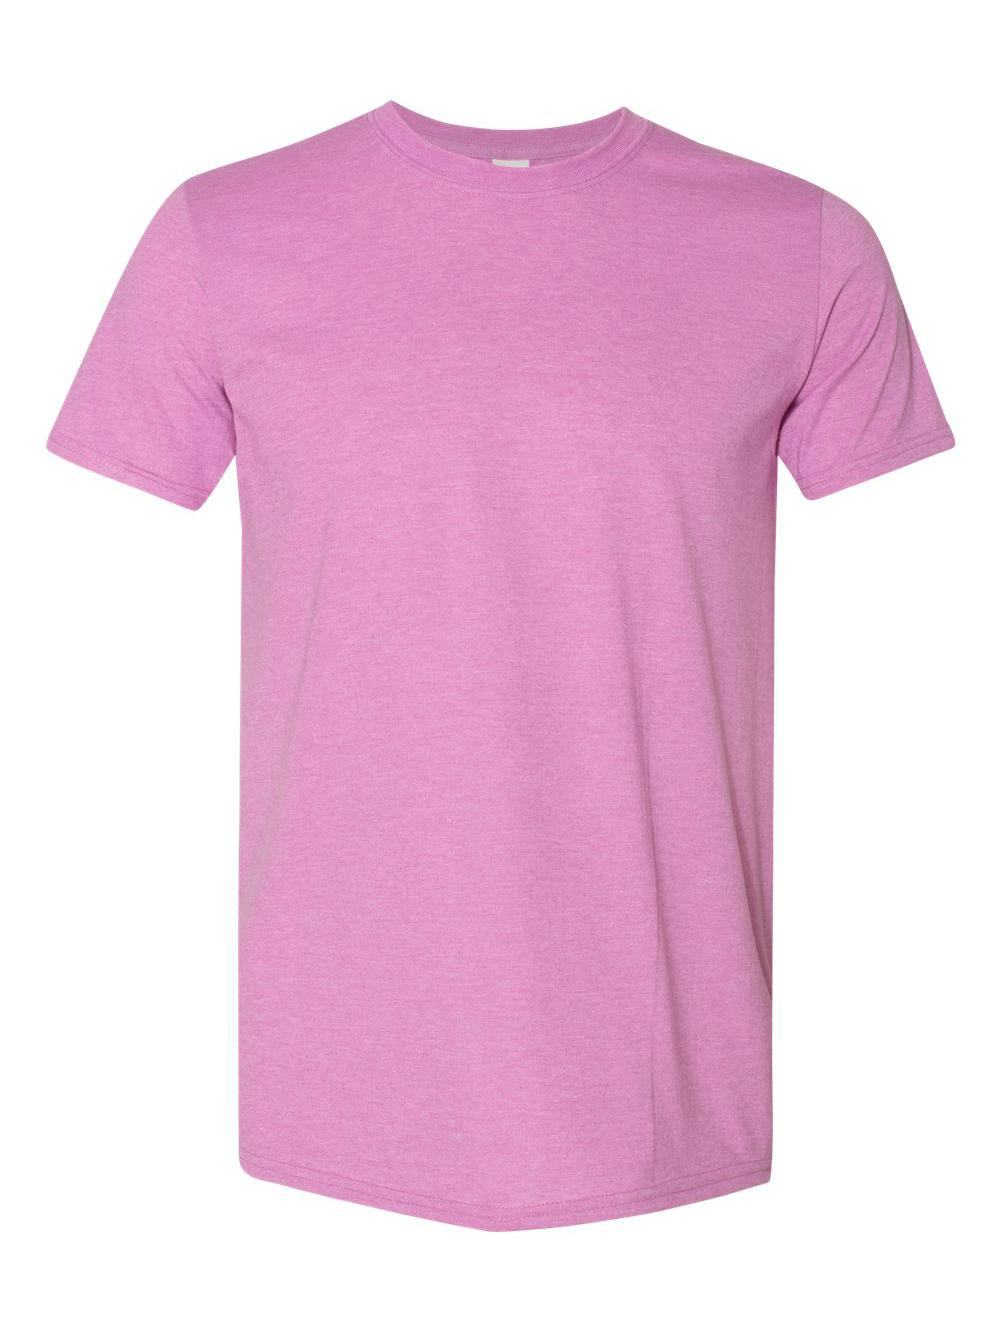 Gildan-Softstyle-T-Shirt-64000 thumbnail 72